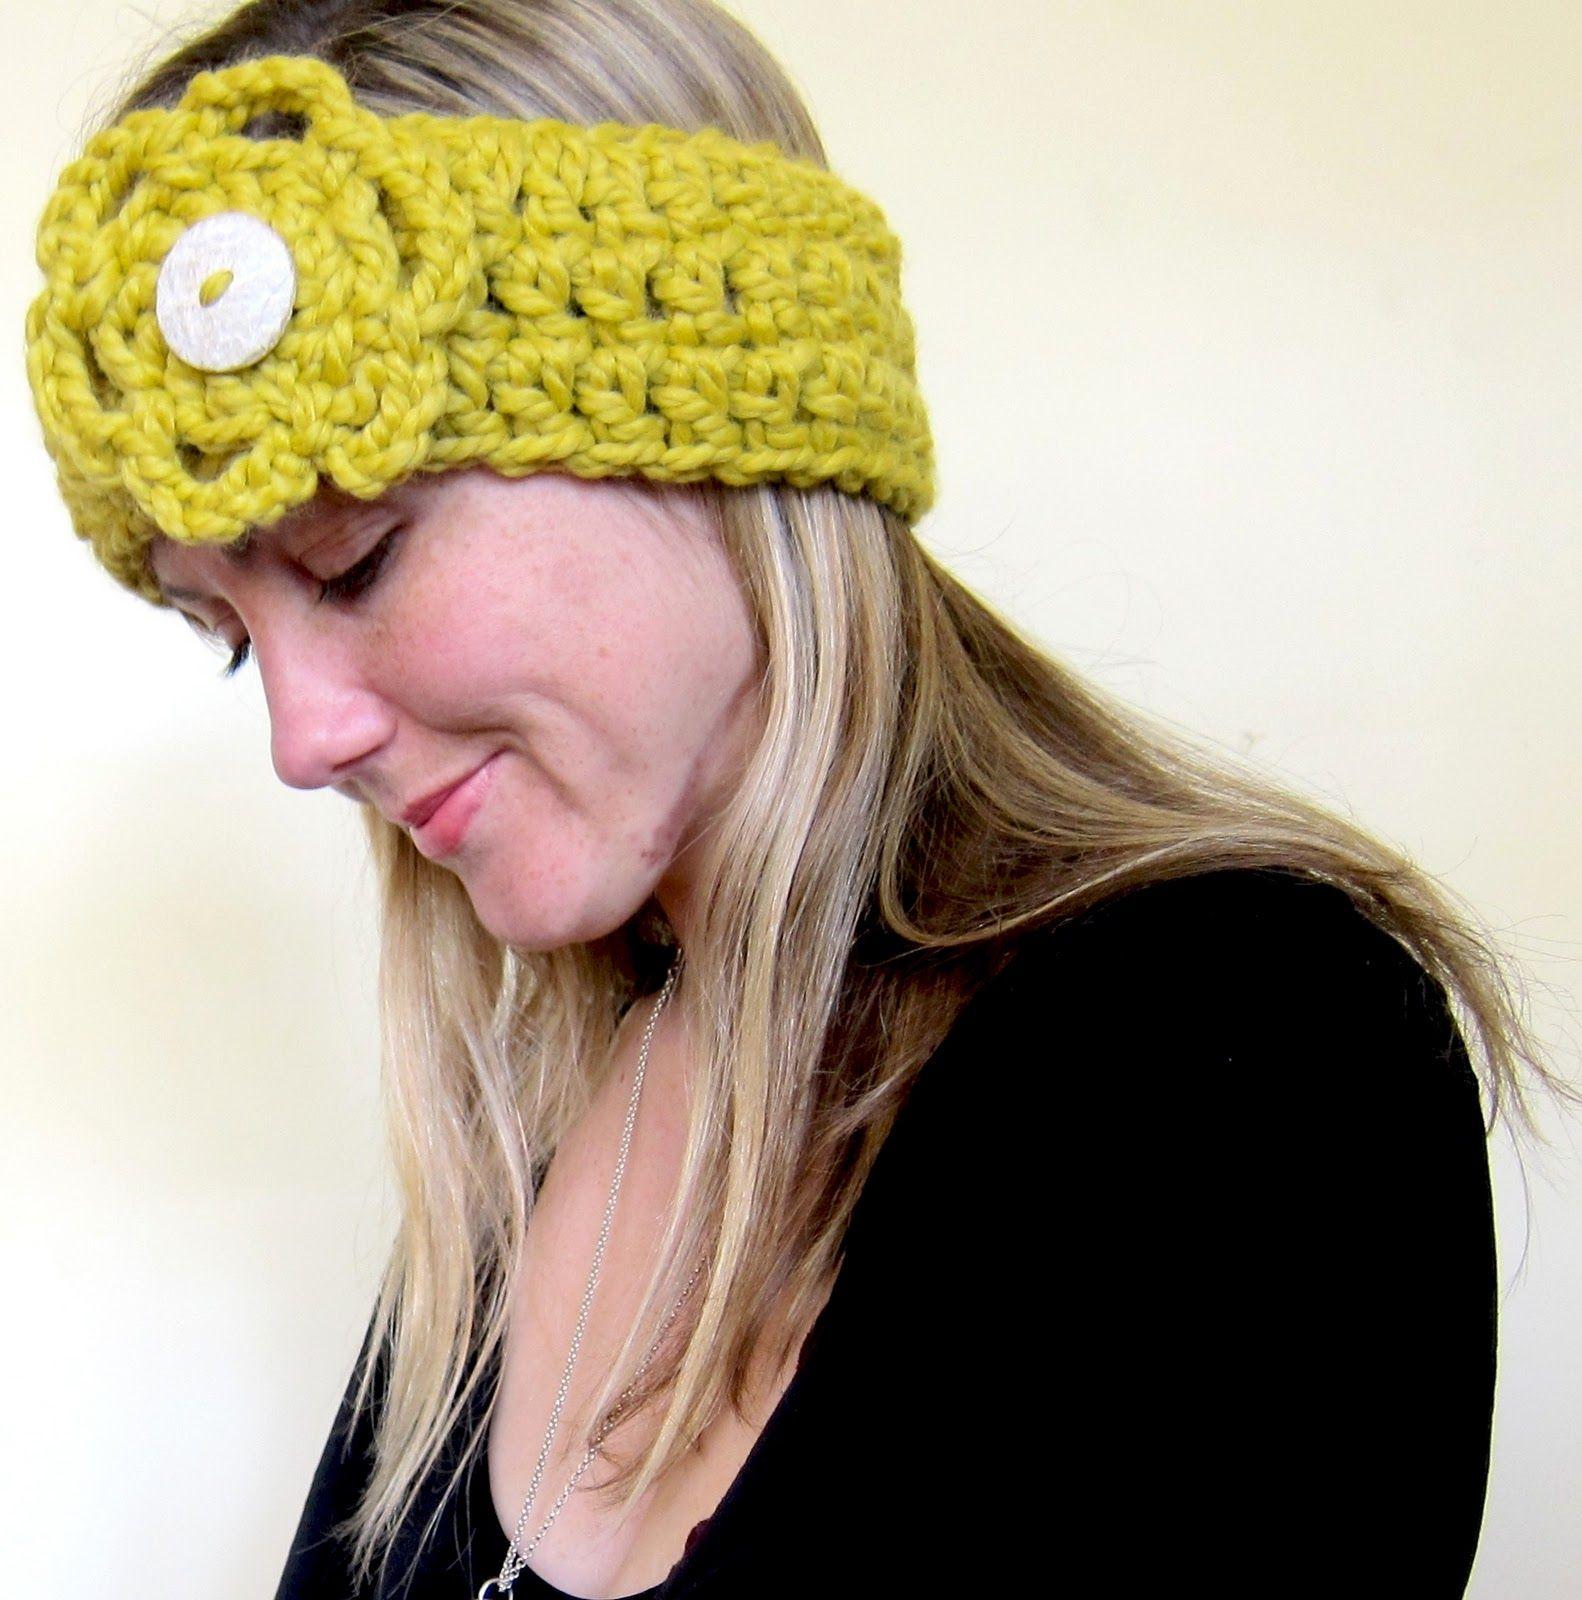 Veryeasycrochetheadbands crochet flower headband crochet mel p designs free crochet headband ear warmer pattern bankloansurffo Image collections